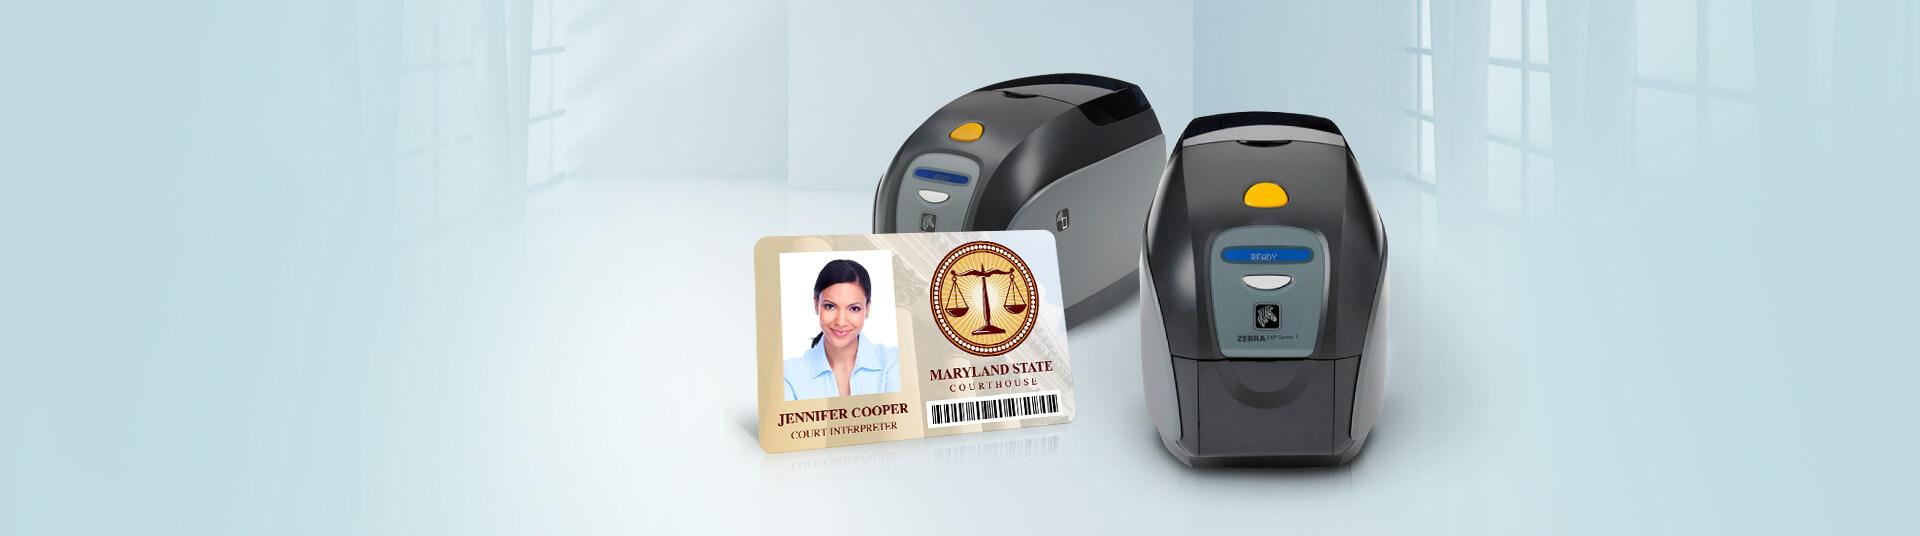 Zebra ZXP Series 1 ID Card Printers